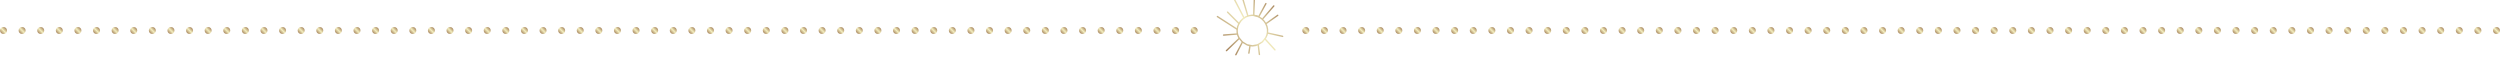 divider-sun.png